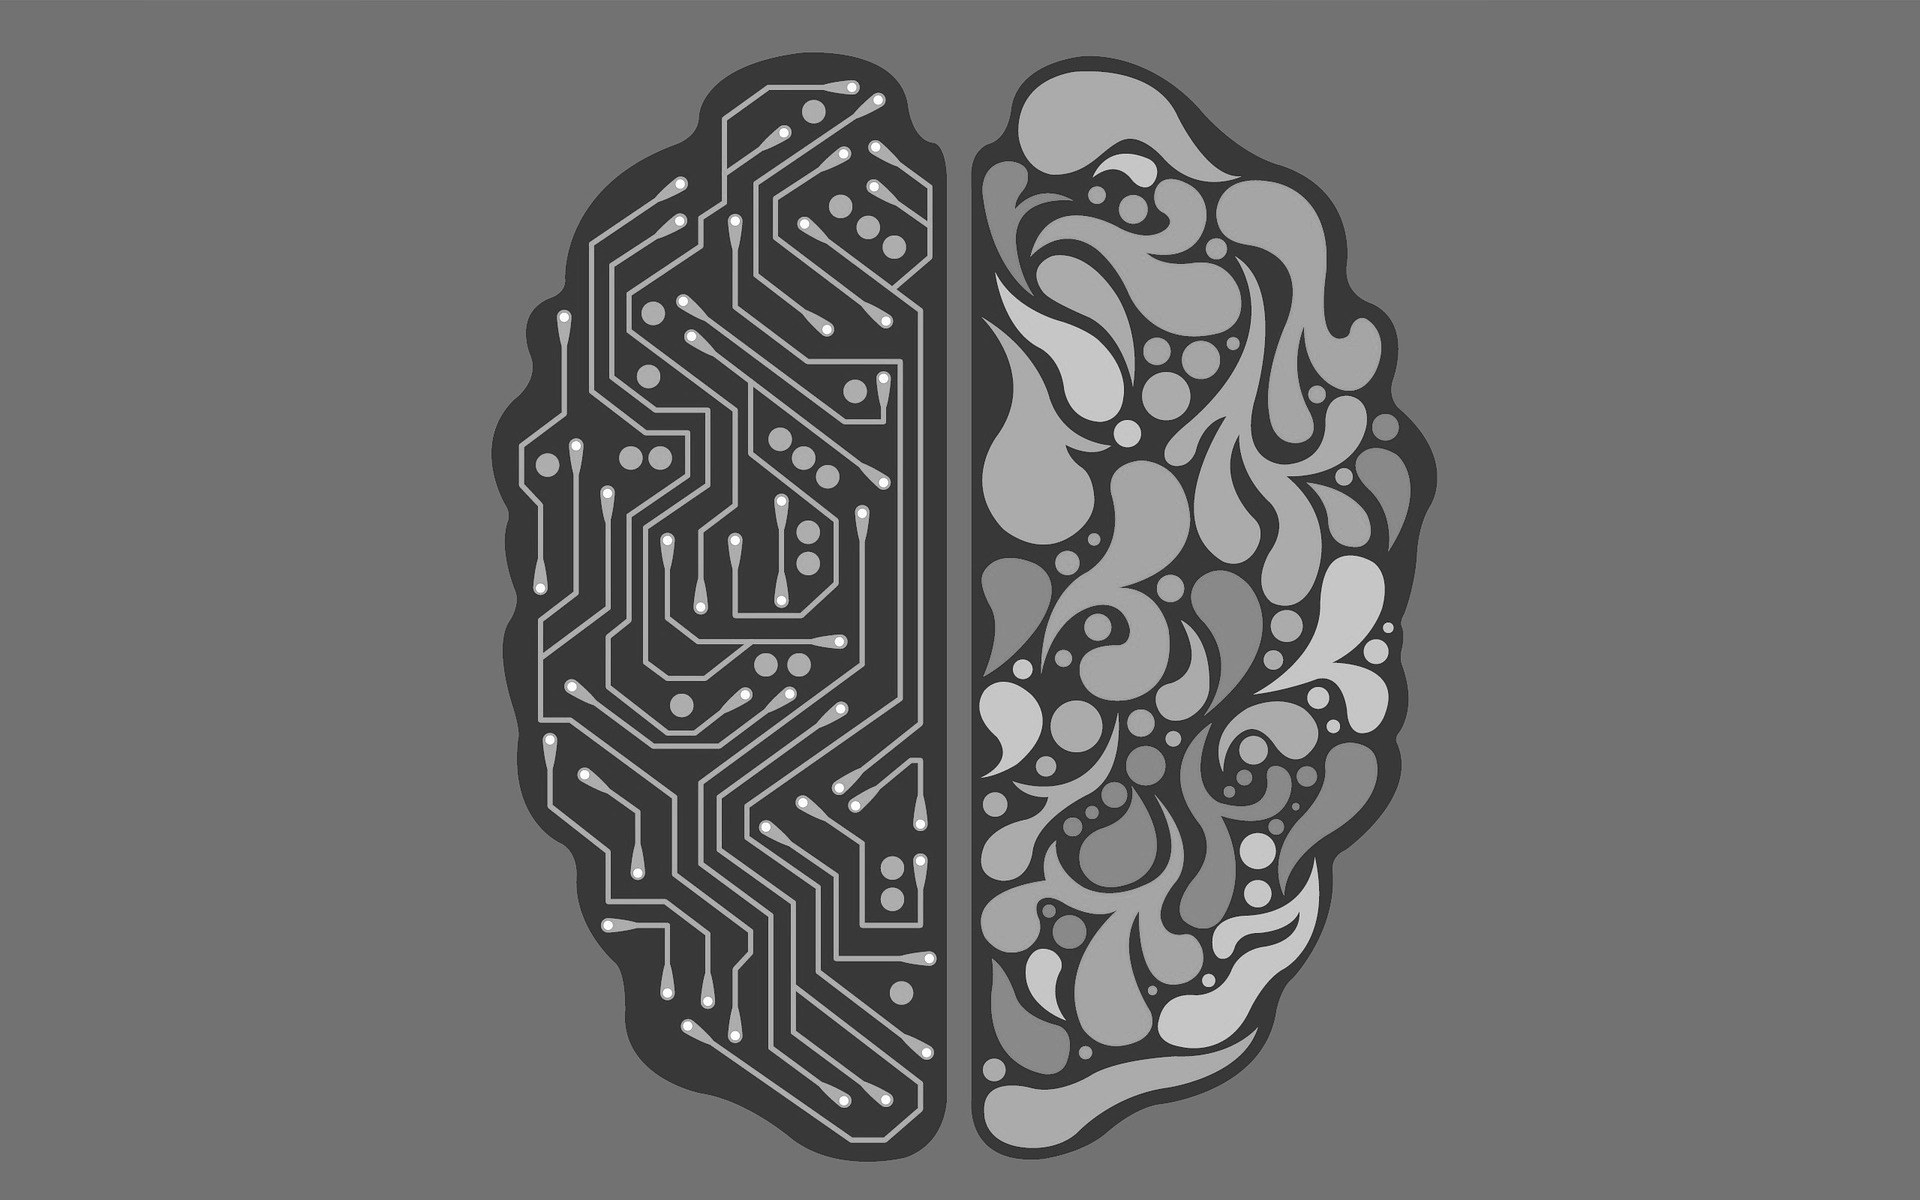 artificial-intelligence-2228610_1920.jpg